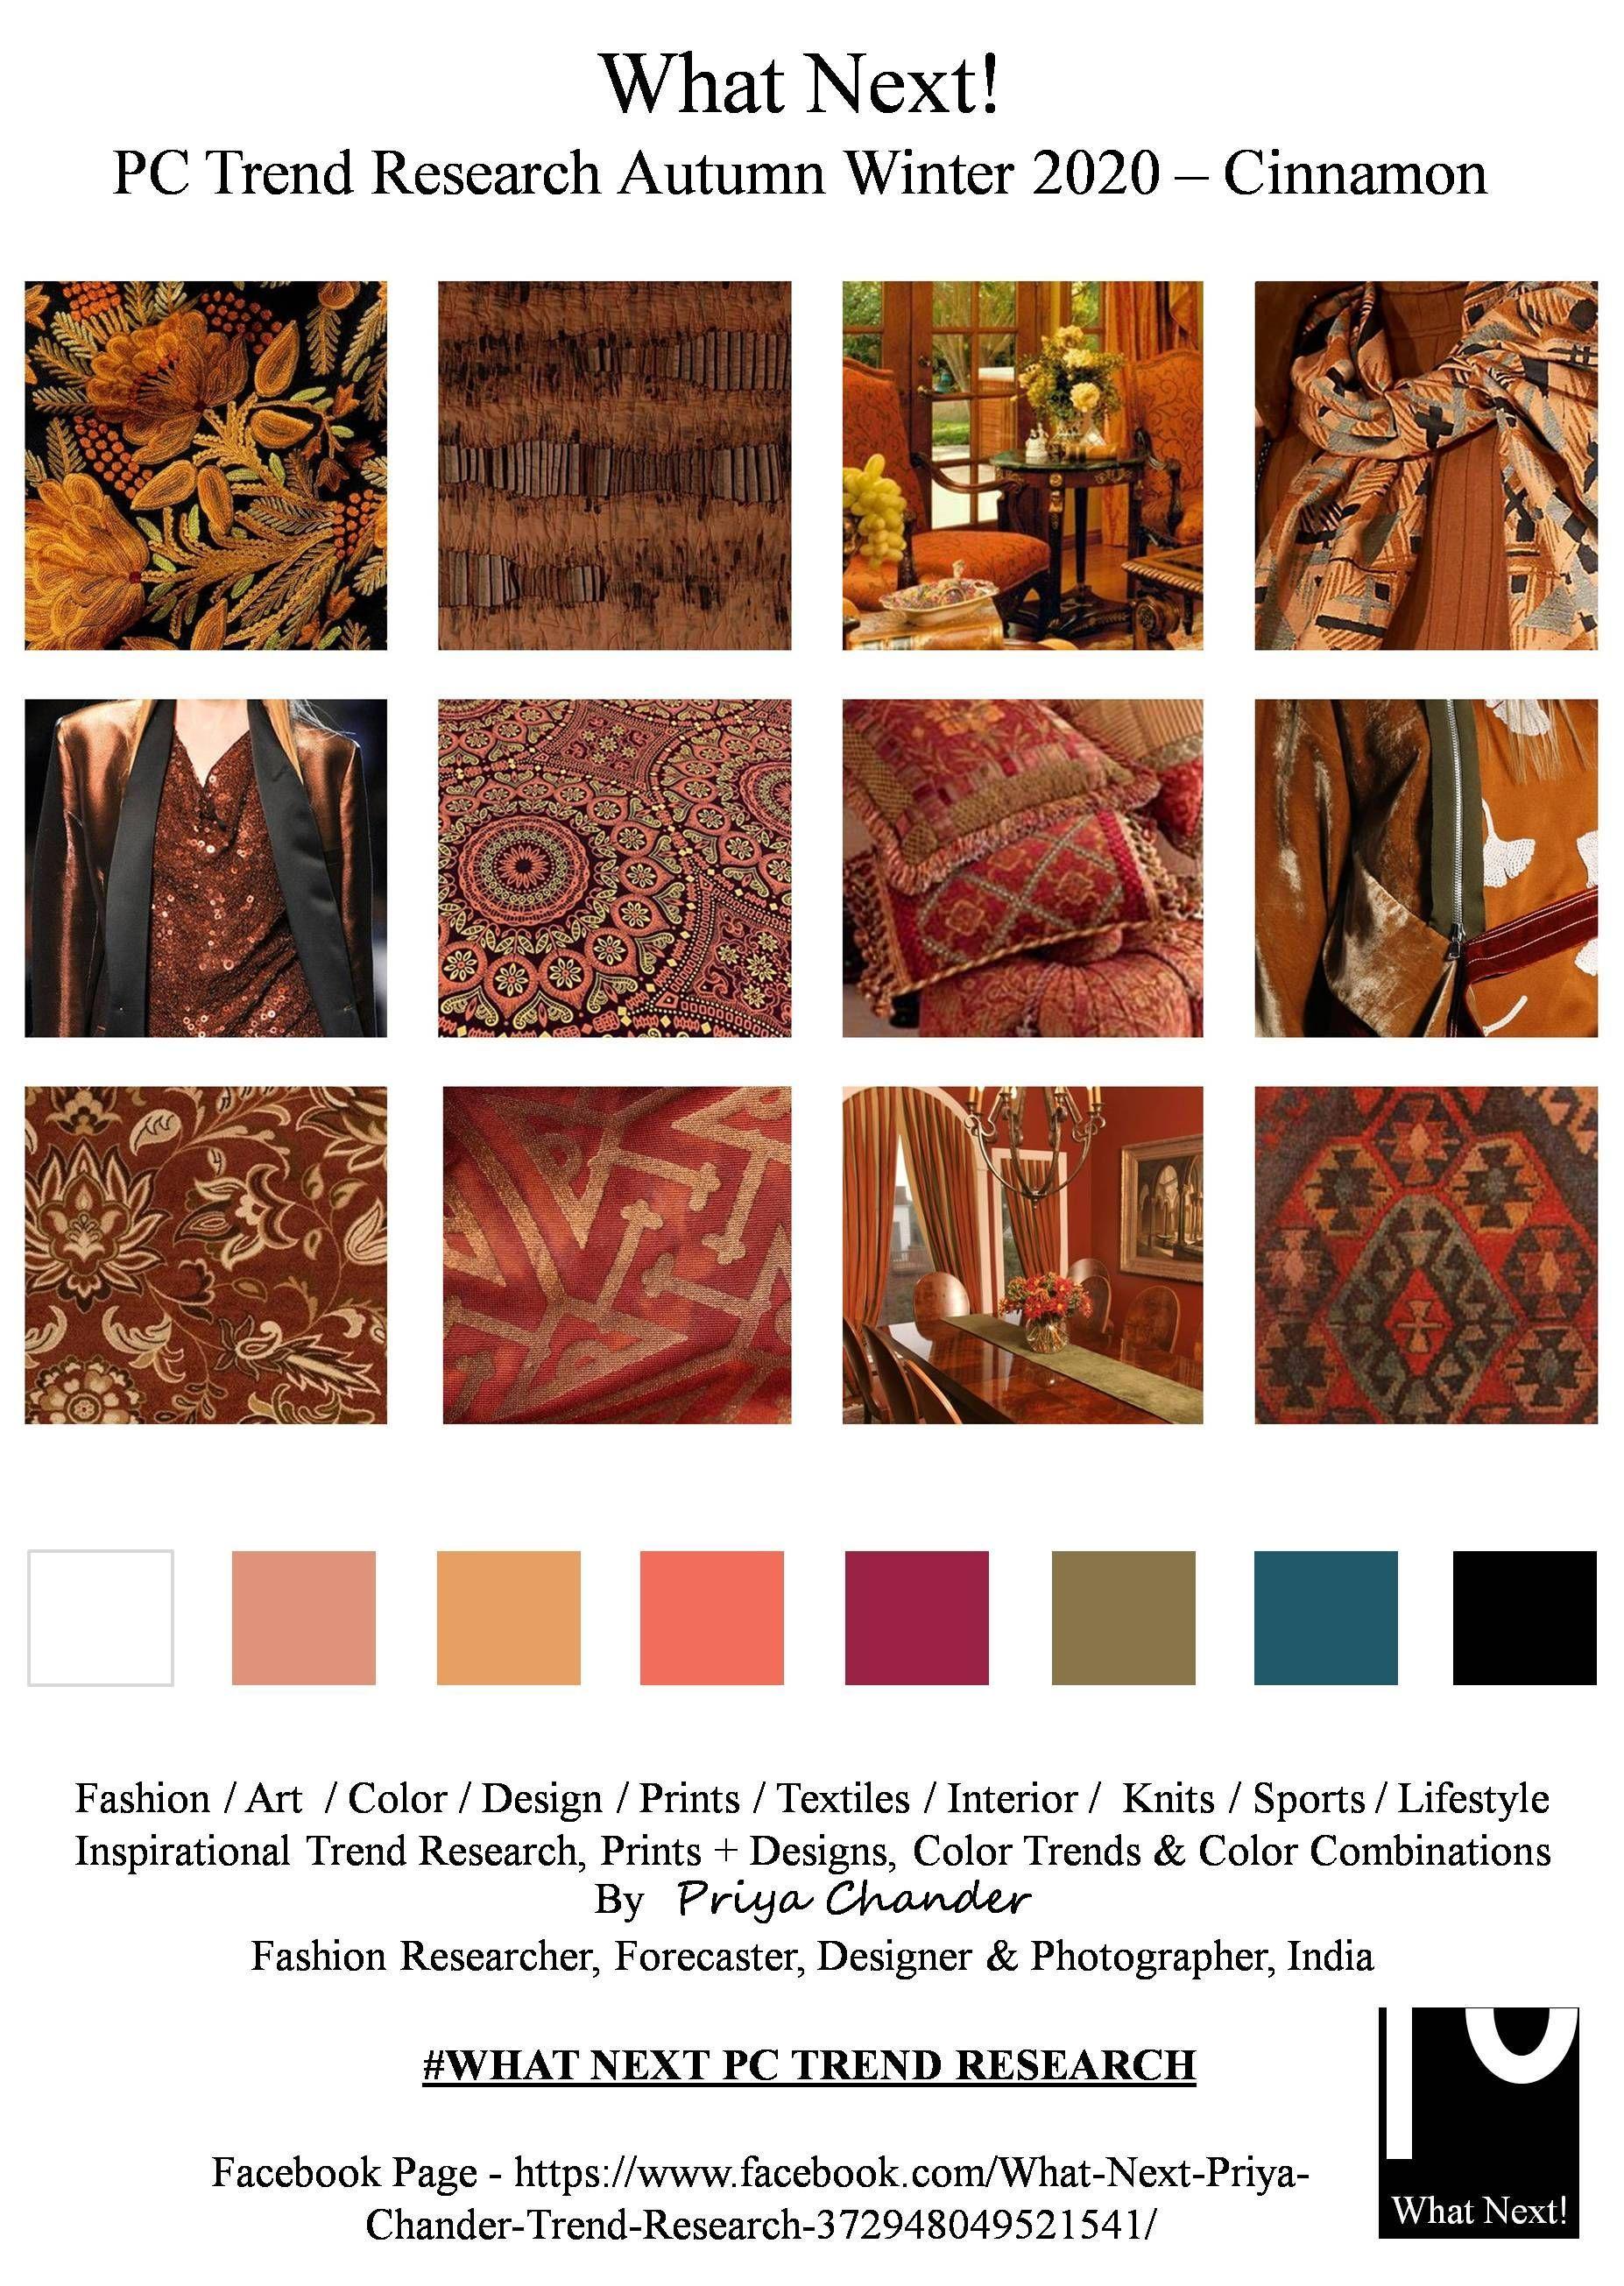 Christmas 2020 Color Trends Weihnachten 2020 Farbtrends Colorchristmas2020 D Color Trends Fashion Color Trends Fashion Design Patterns